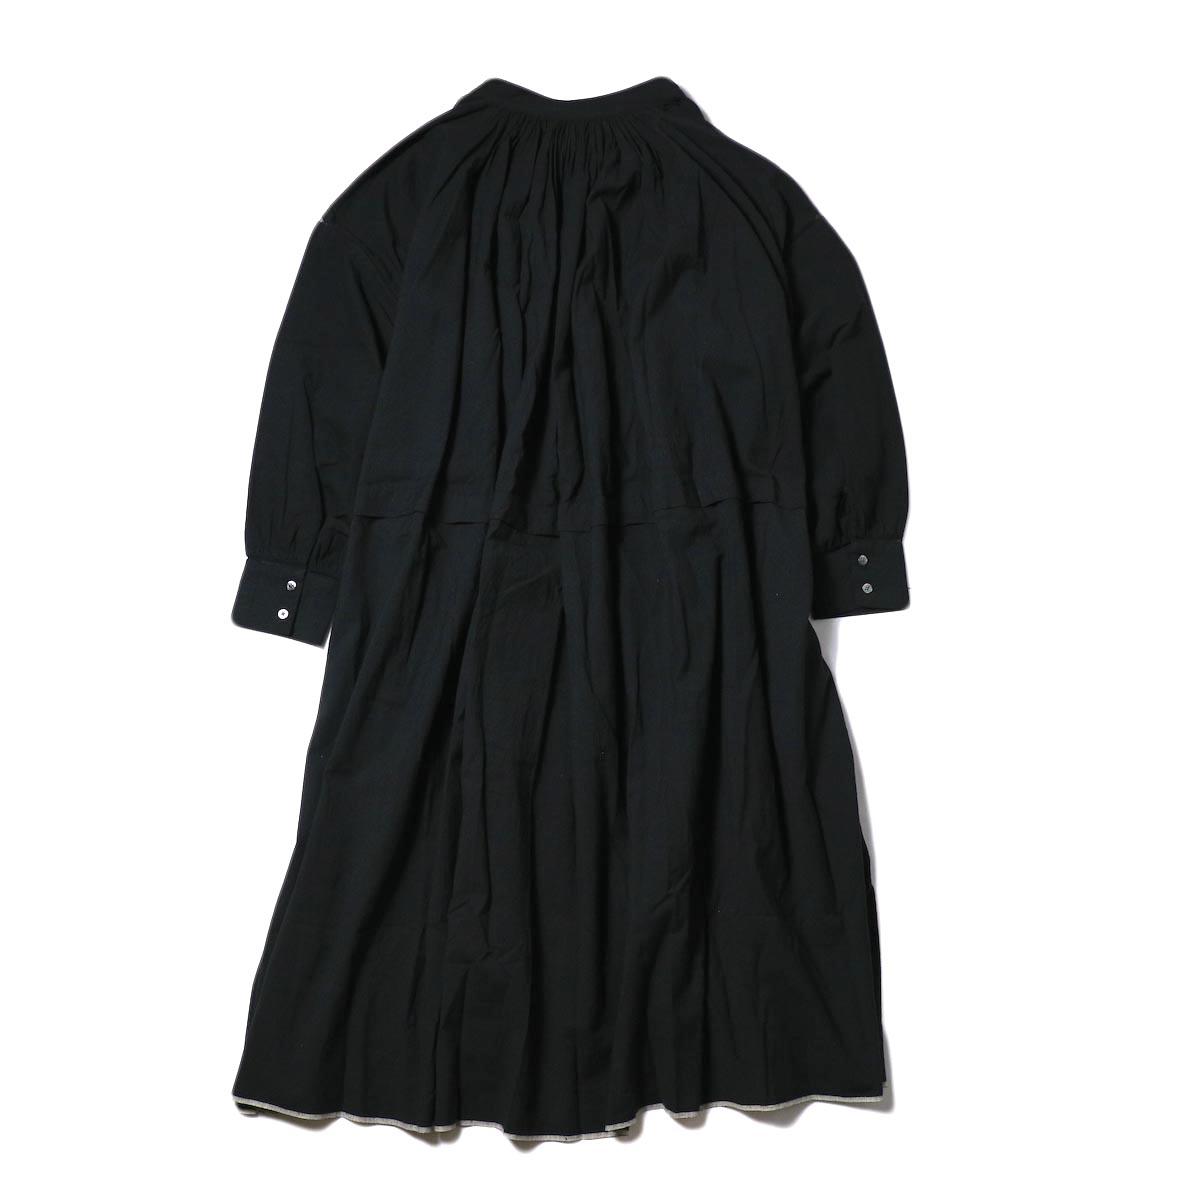 maison de soil / NECK GATHERED DRESS (black) 背面